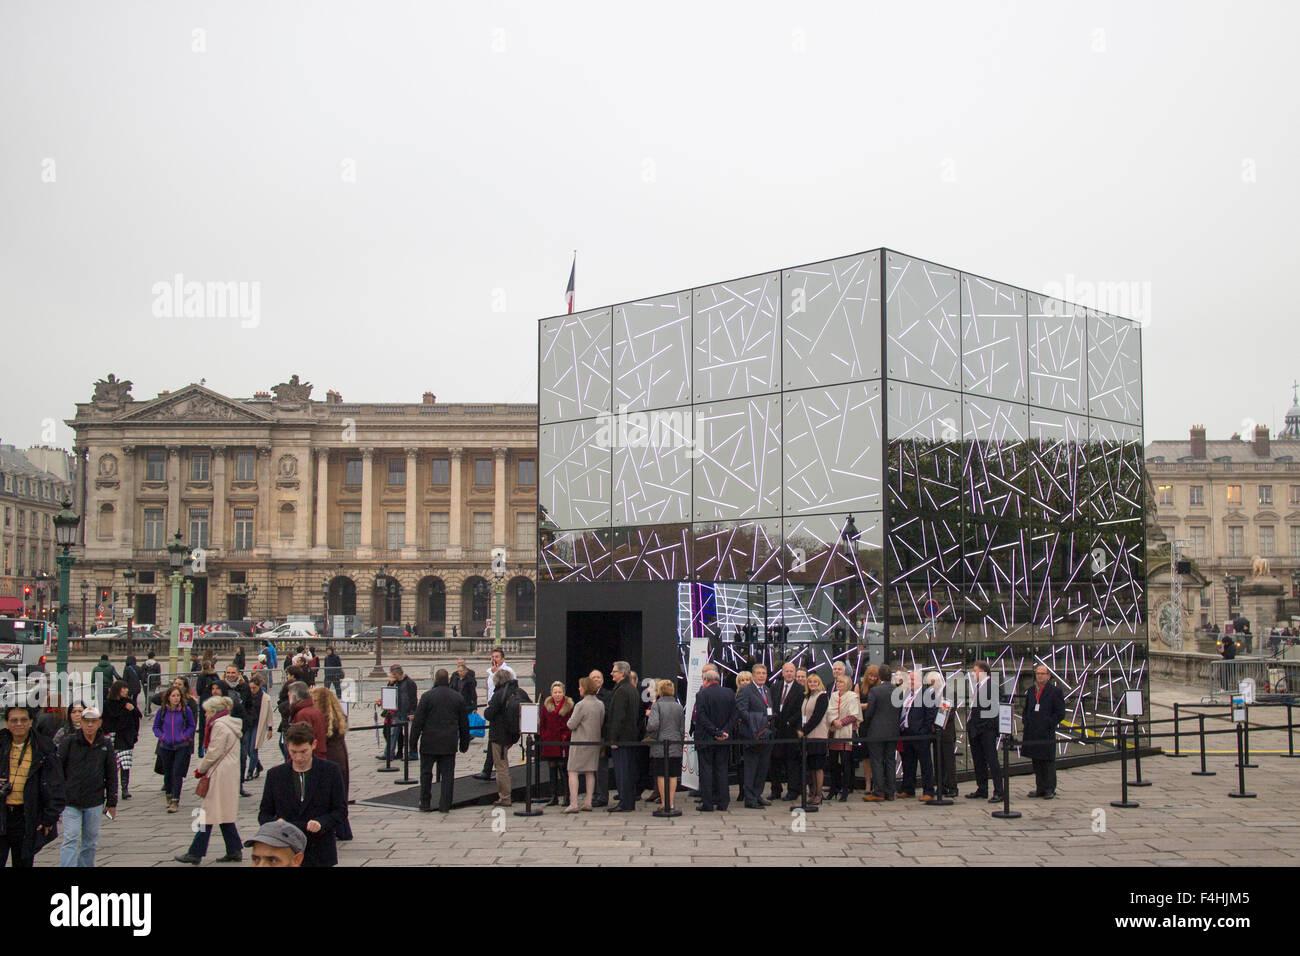 Saint Gobain celebrating its 350th anniversary four pavilions, called Future Sensations at Place de la Concorde - Stock Image